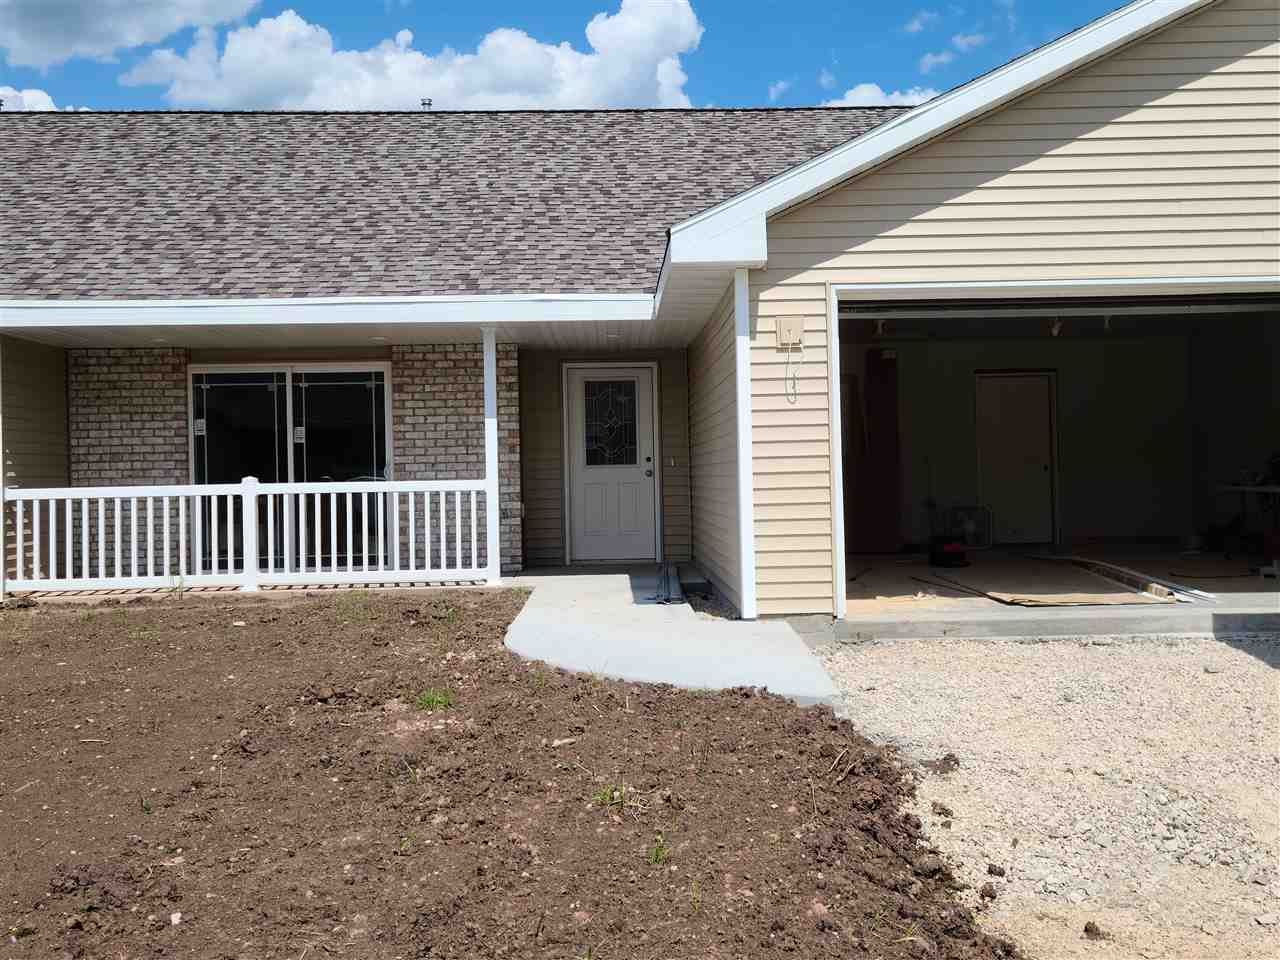 104 STONE CASTLE Drive, Fond du Lac, WI 54935 - MLS#: 50226909